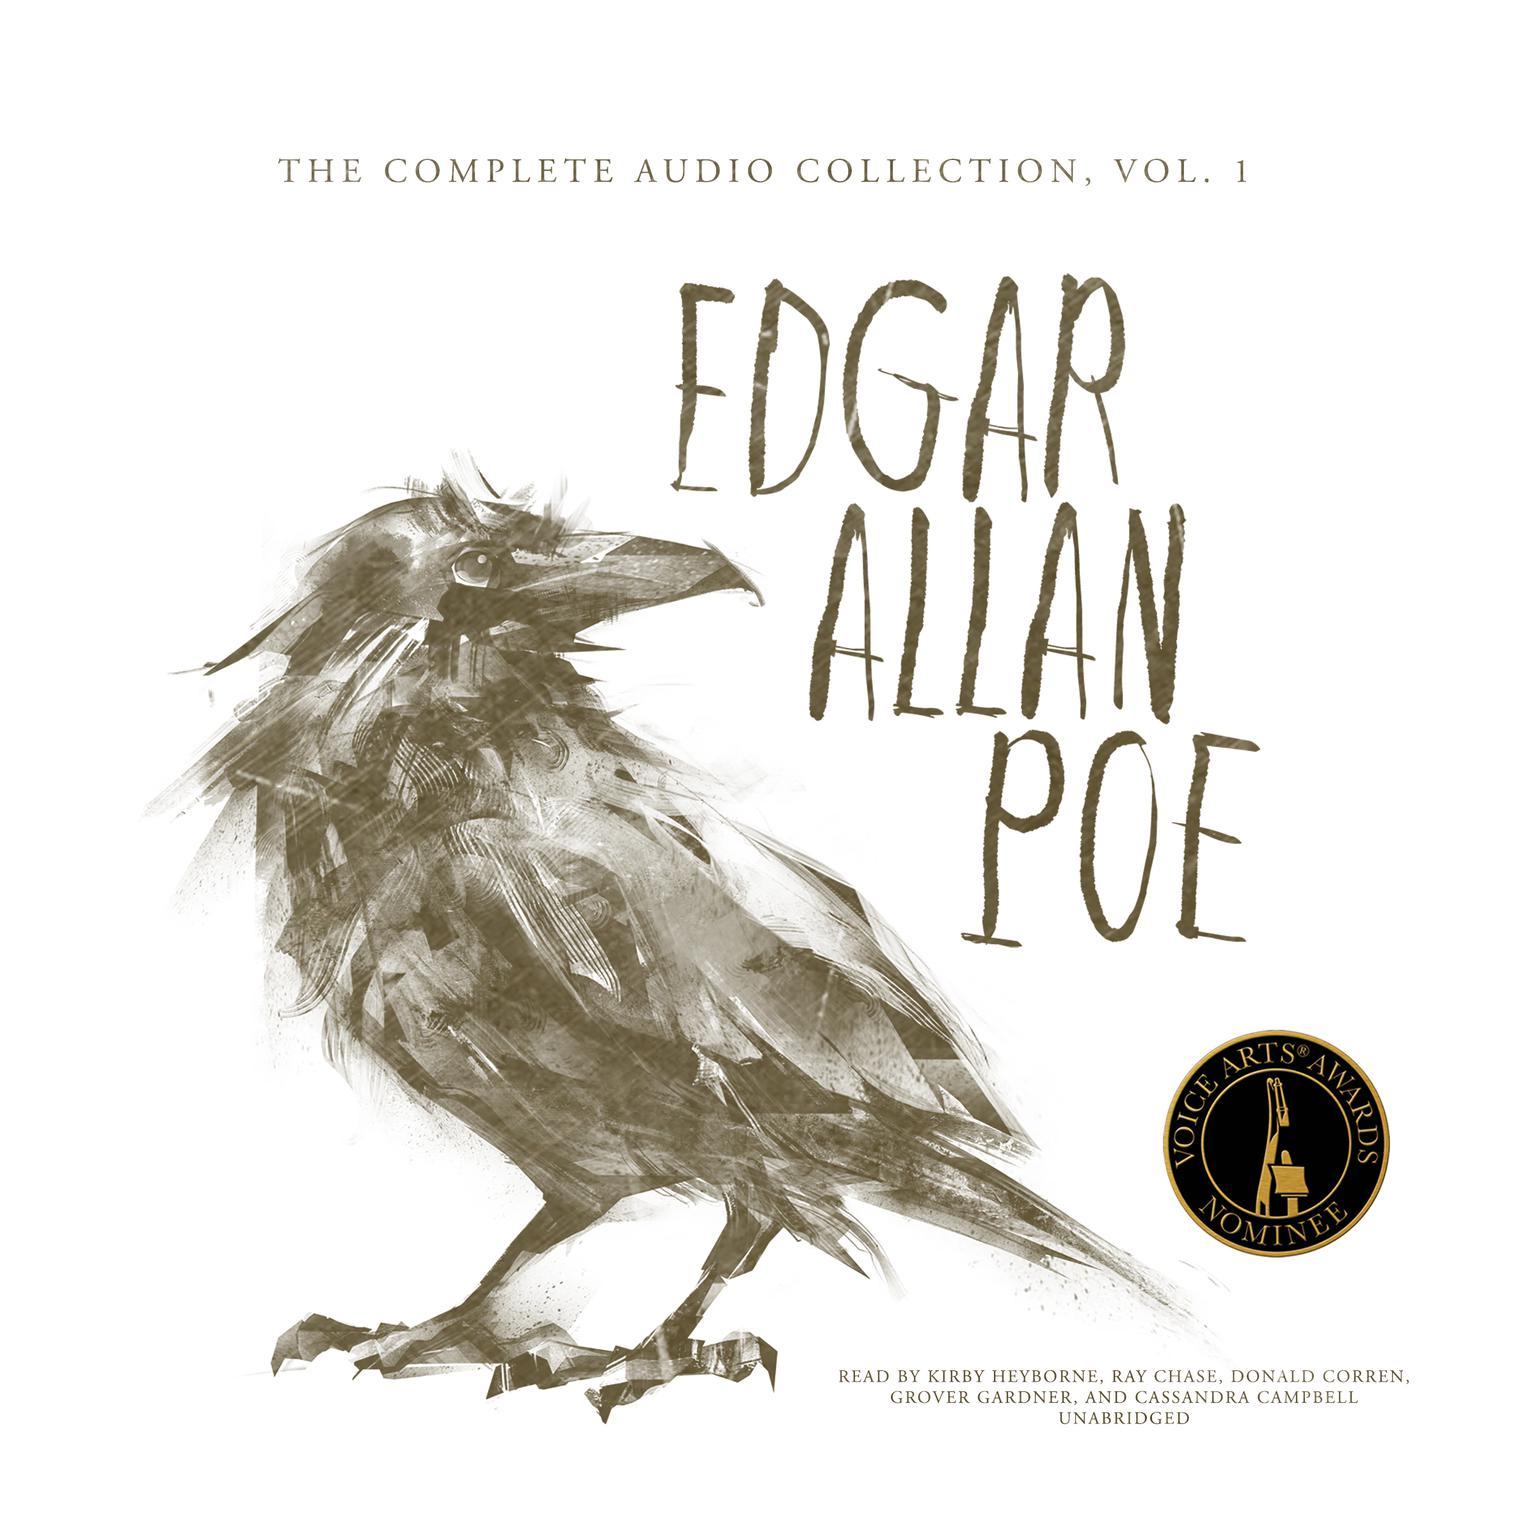 Edgar Allan Poe: The Complete Audio Collection, Vol. 1 Audiobook, by Edgar Allan Poe